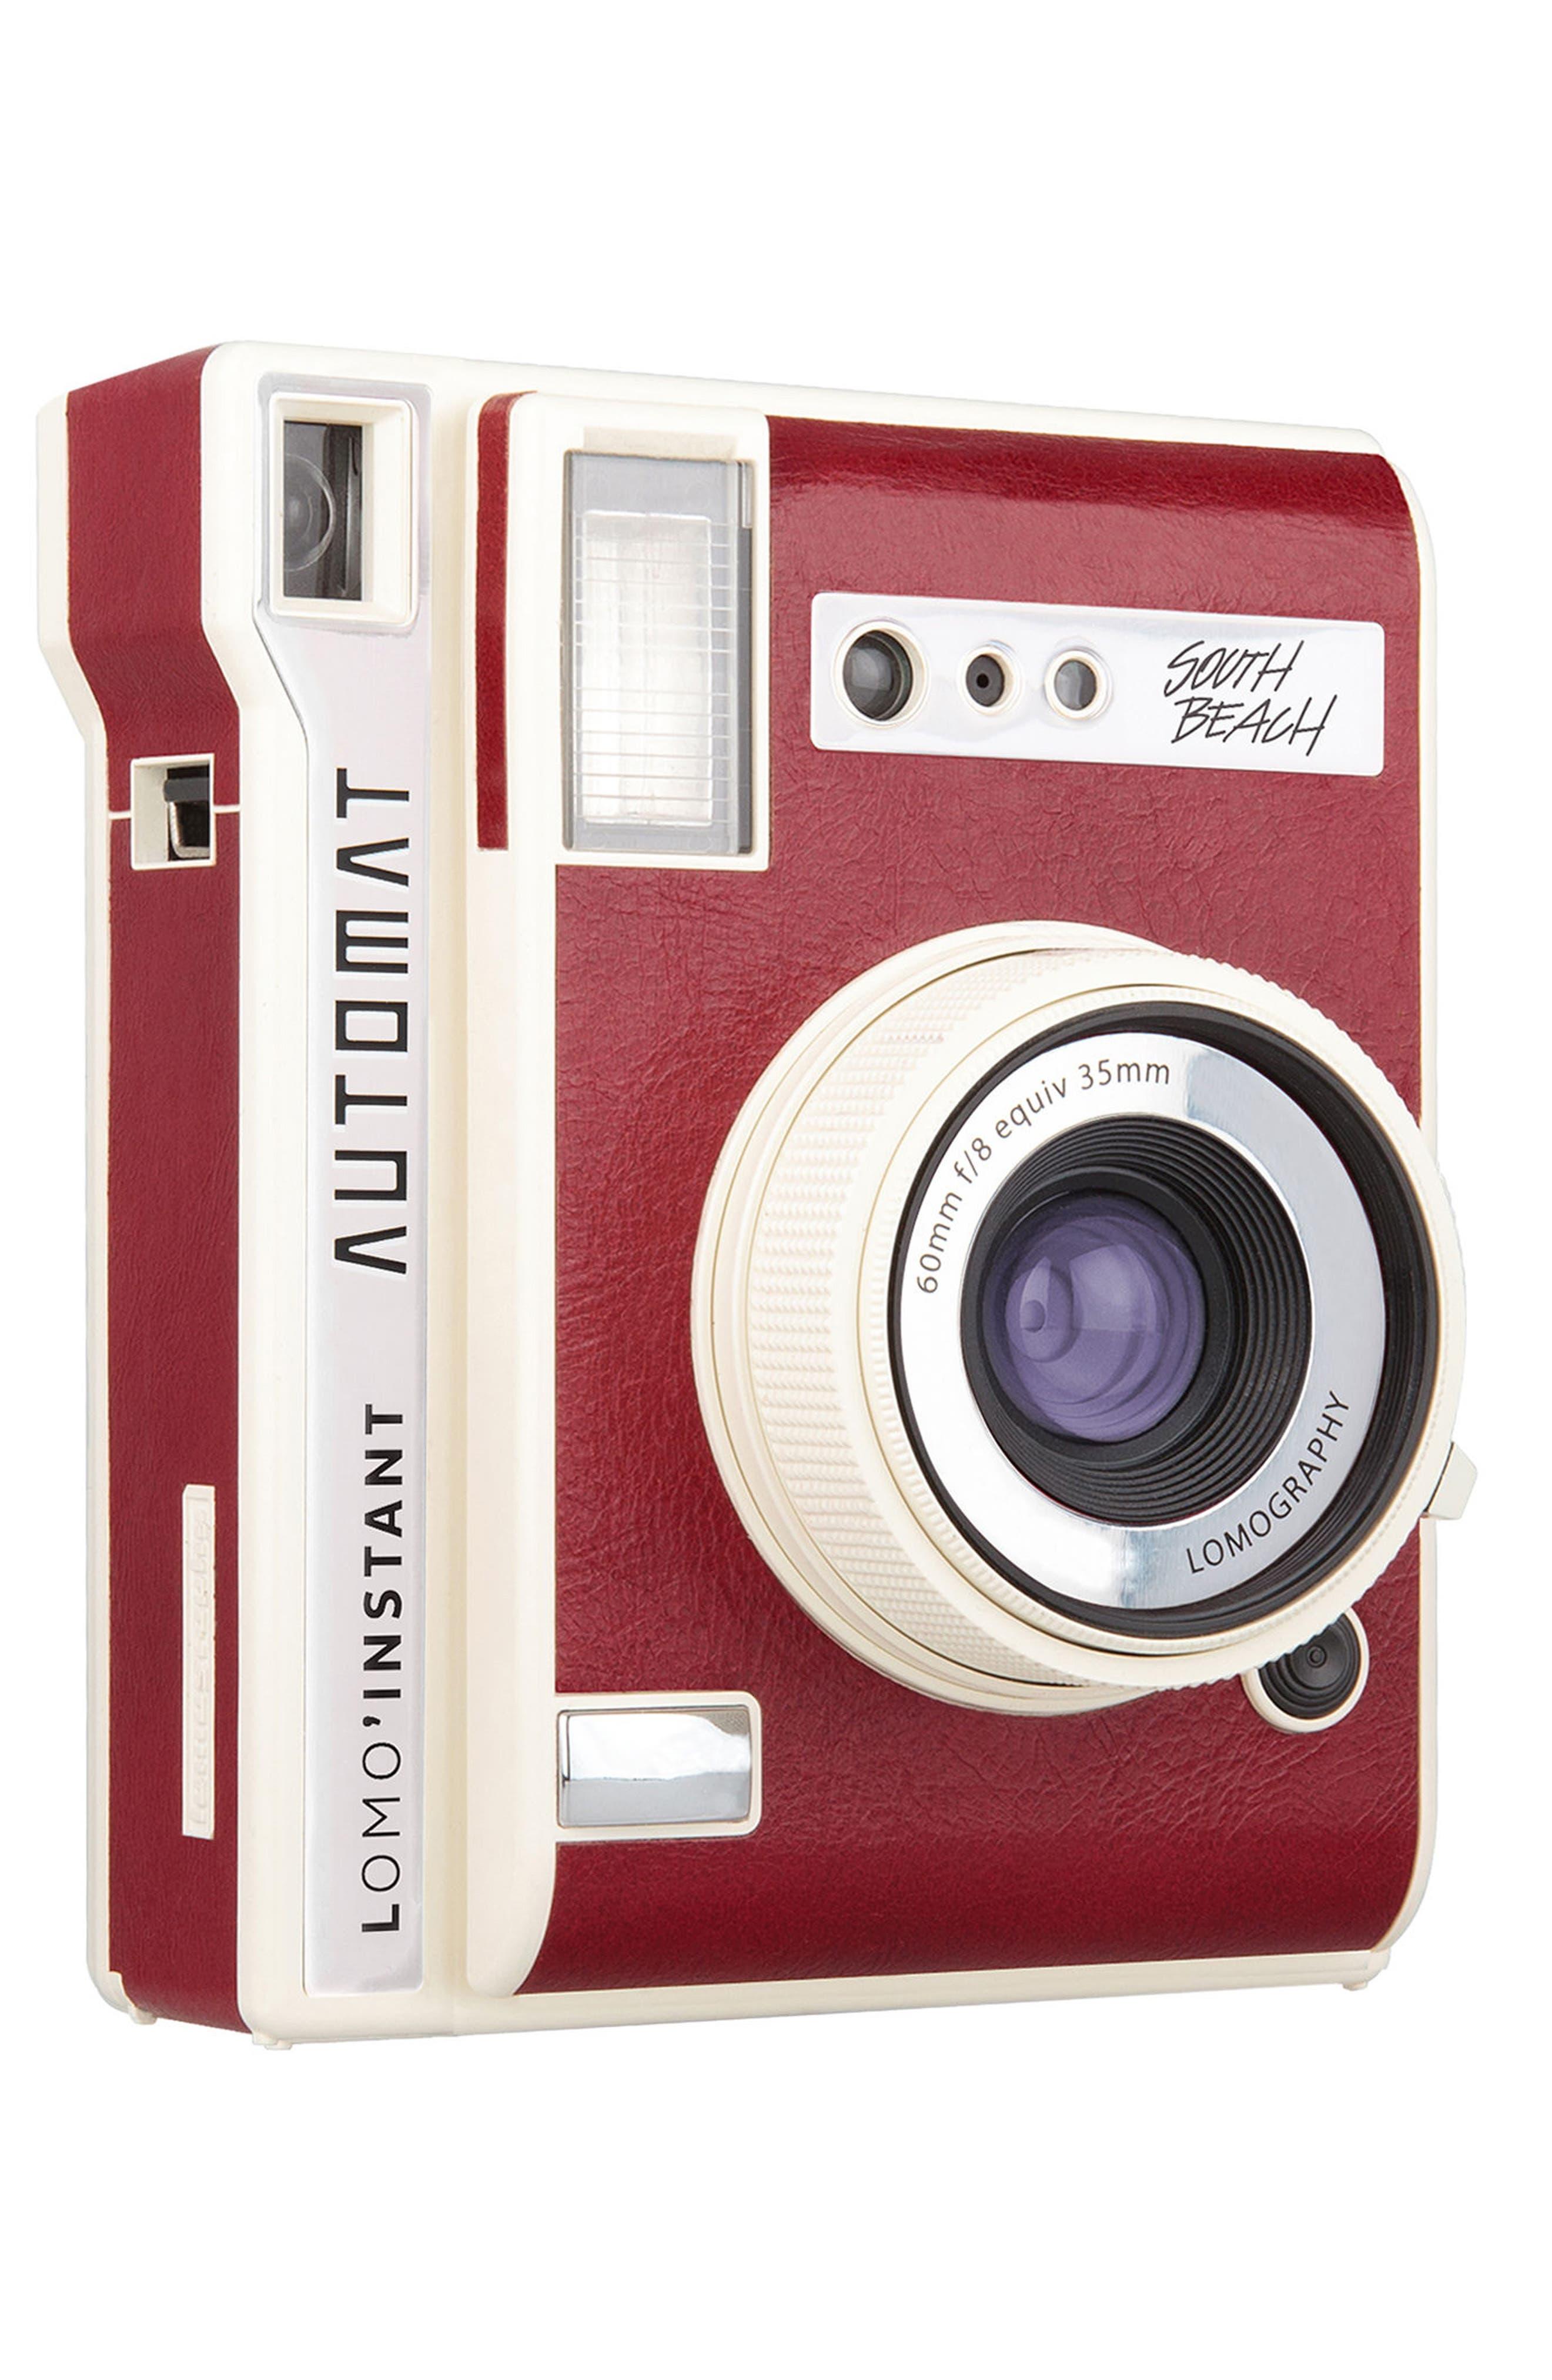 Lomo'Instant Automat South Beach Instant Camera,                             Alternate thumbnail 5, color,                             600